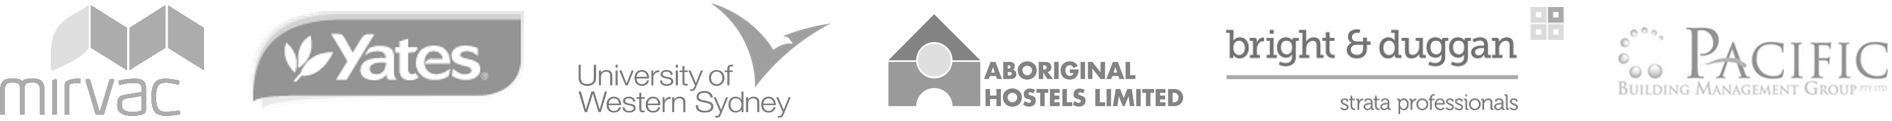 Aerocycle, Commercial Plumbing Contractor Sydney